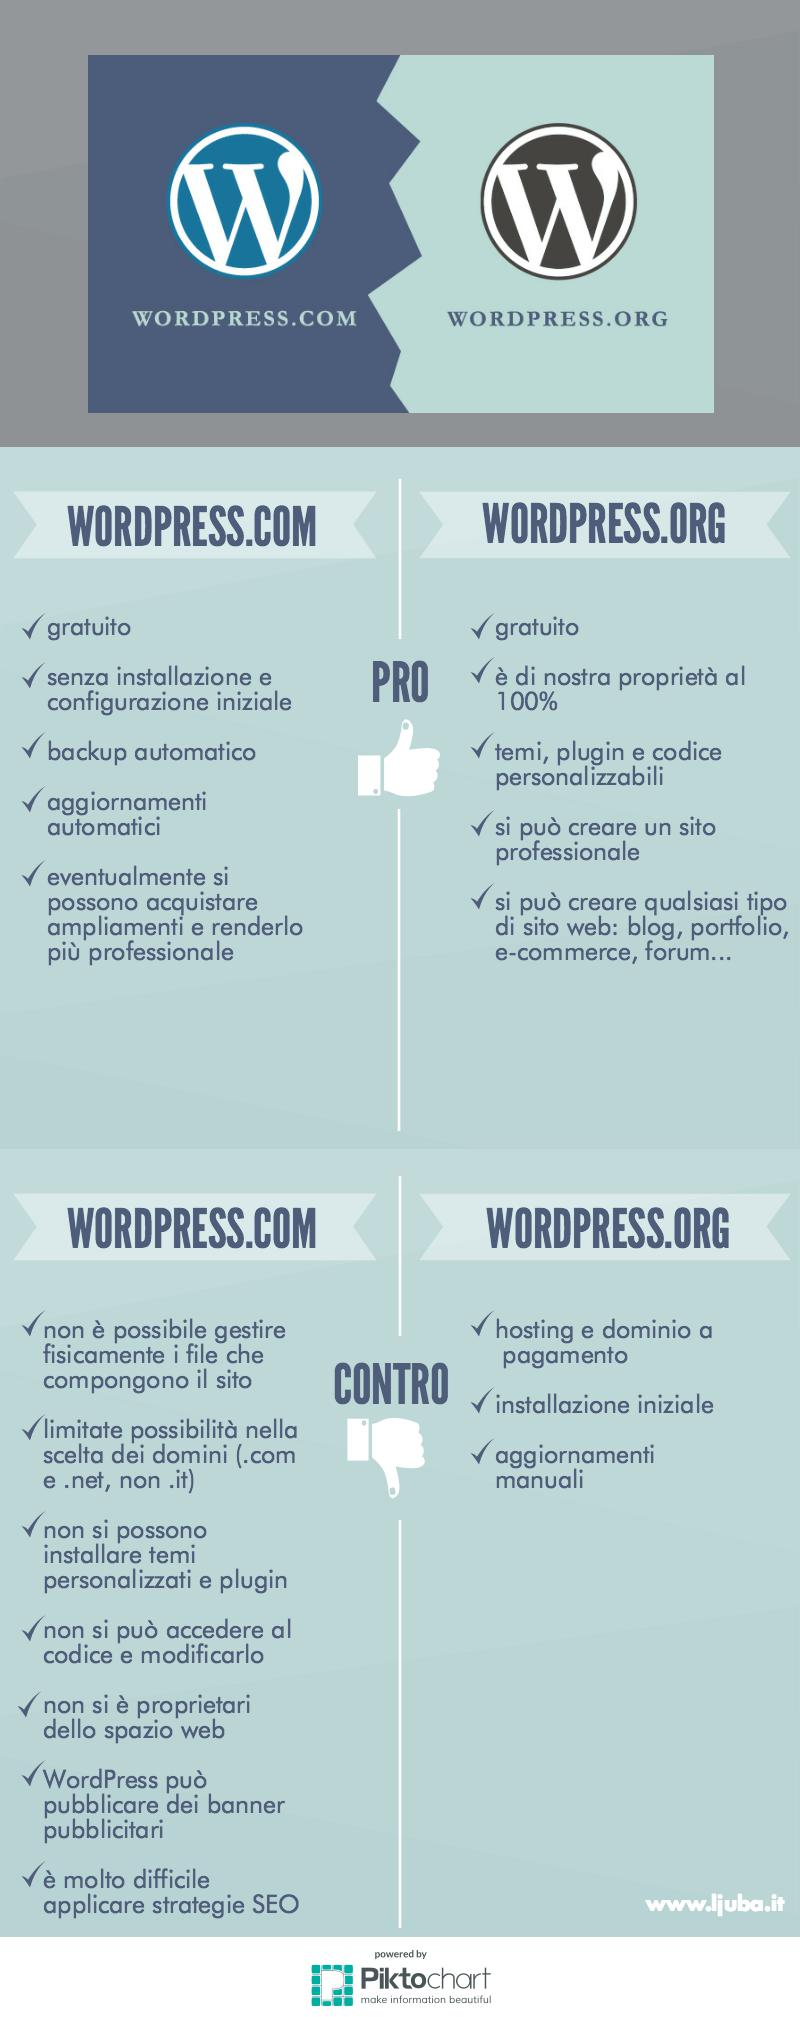 infografica wordpress.com e wordpress.org